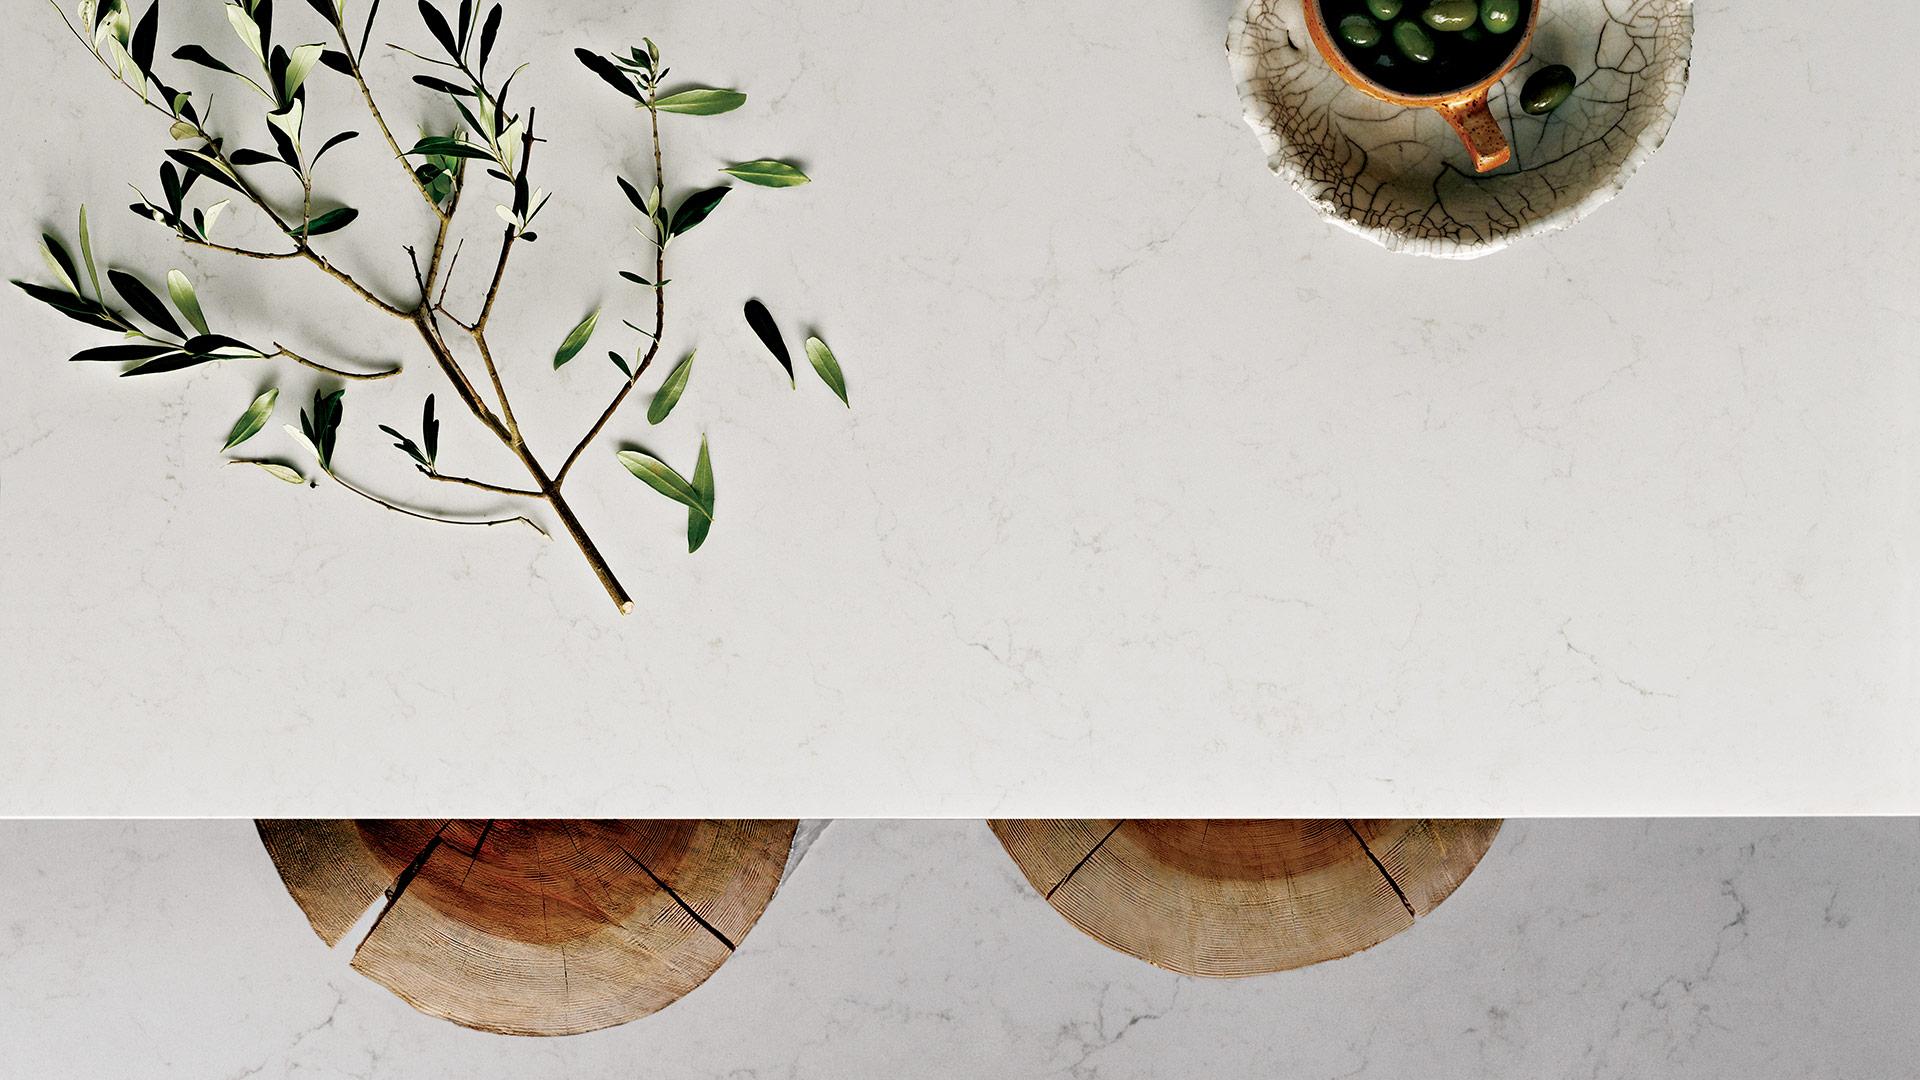 5141_Frosty-Carrina_olives-1920X1080